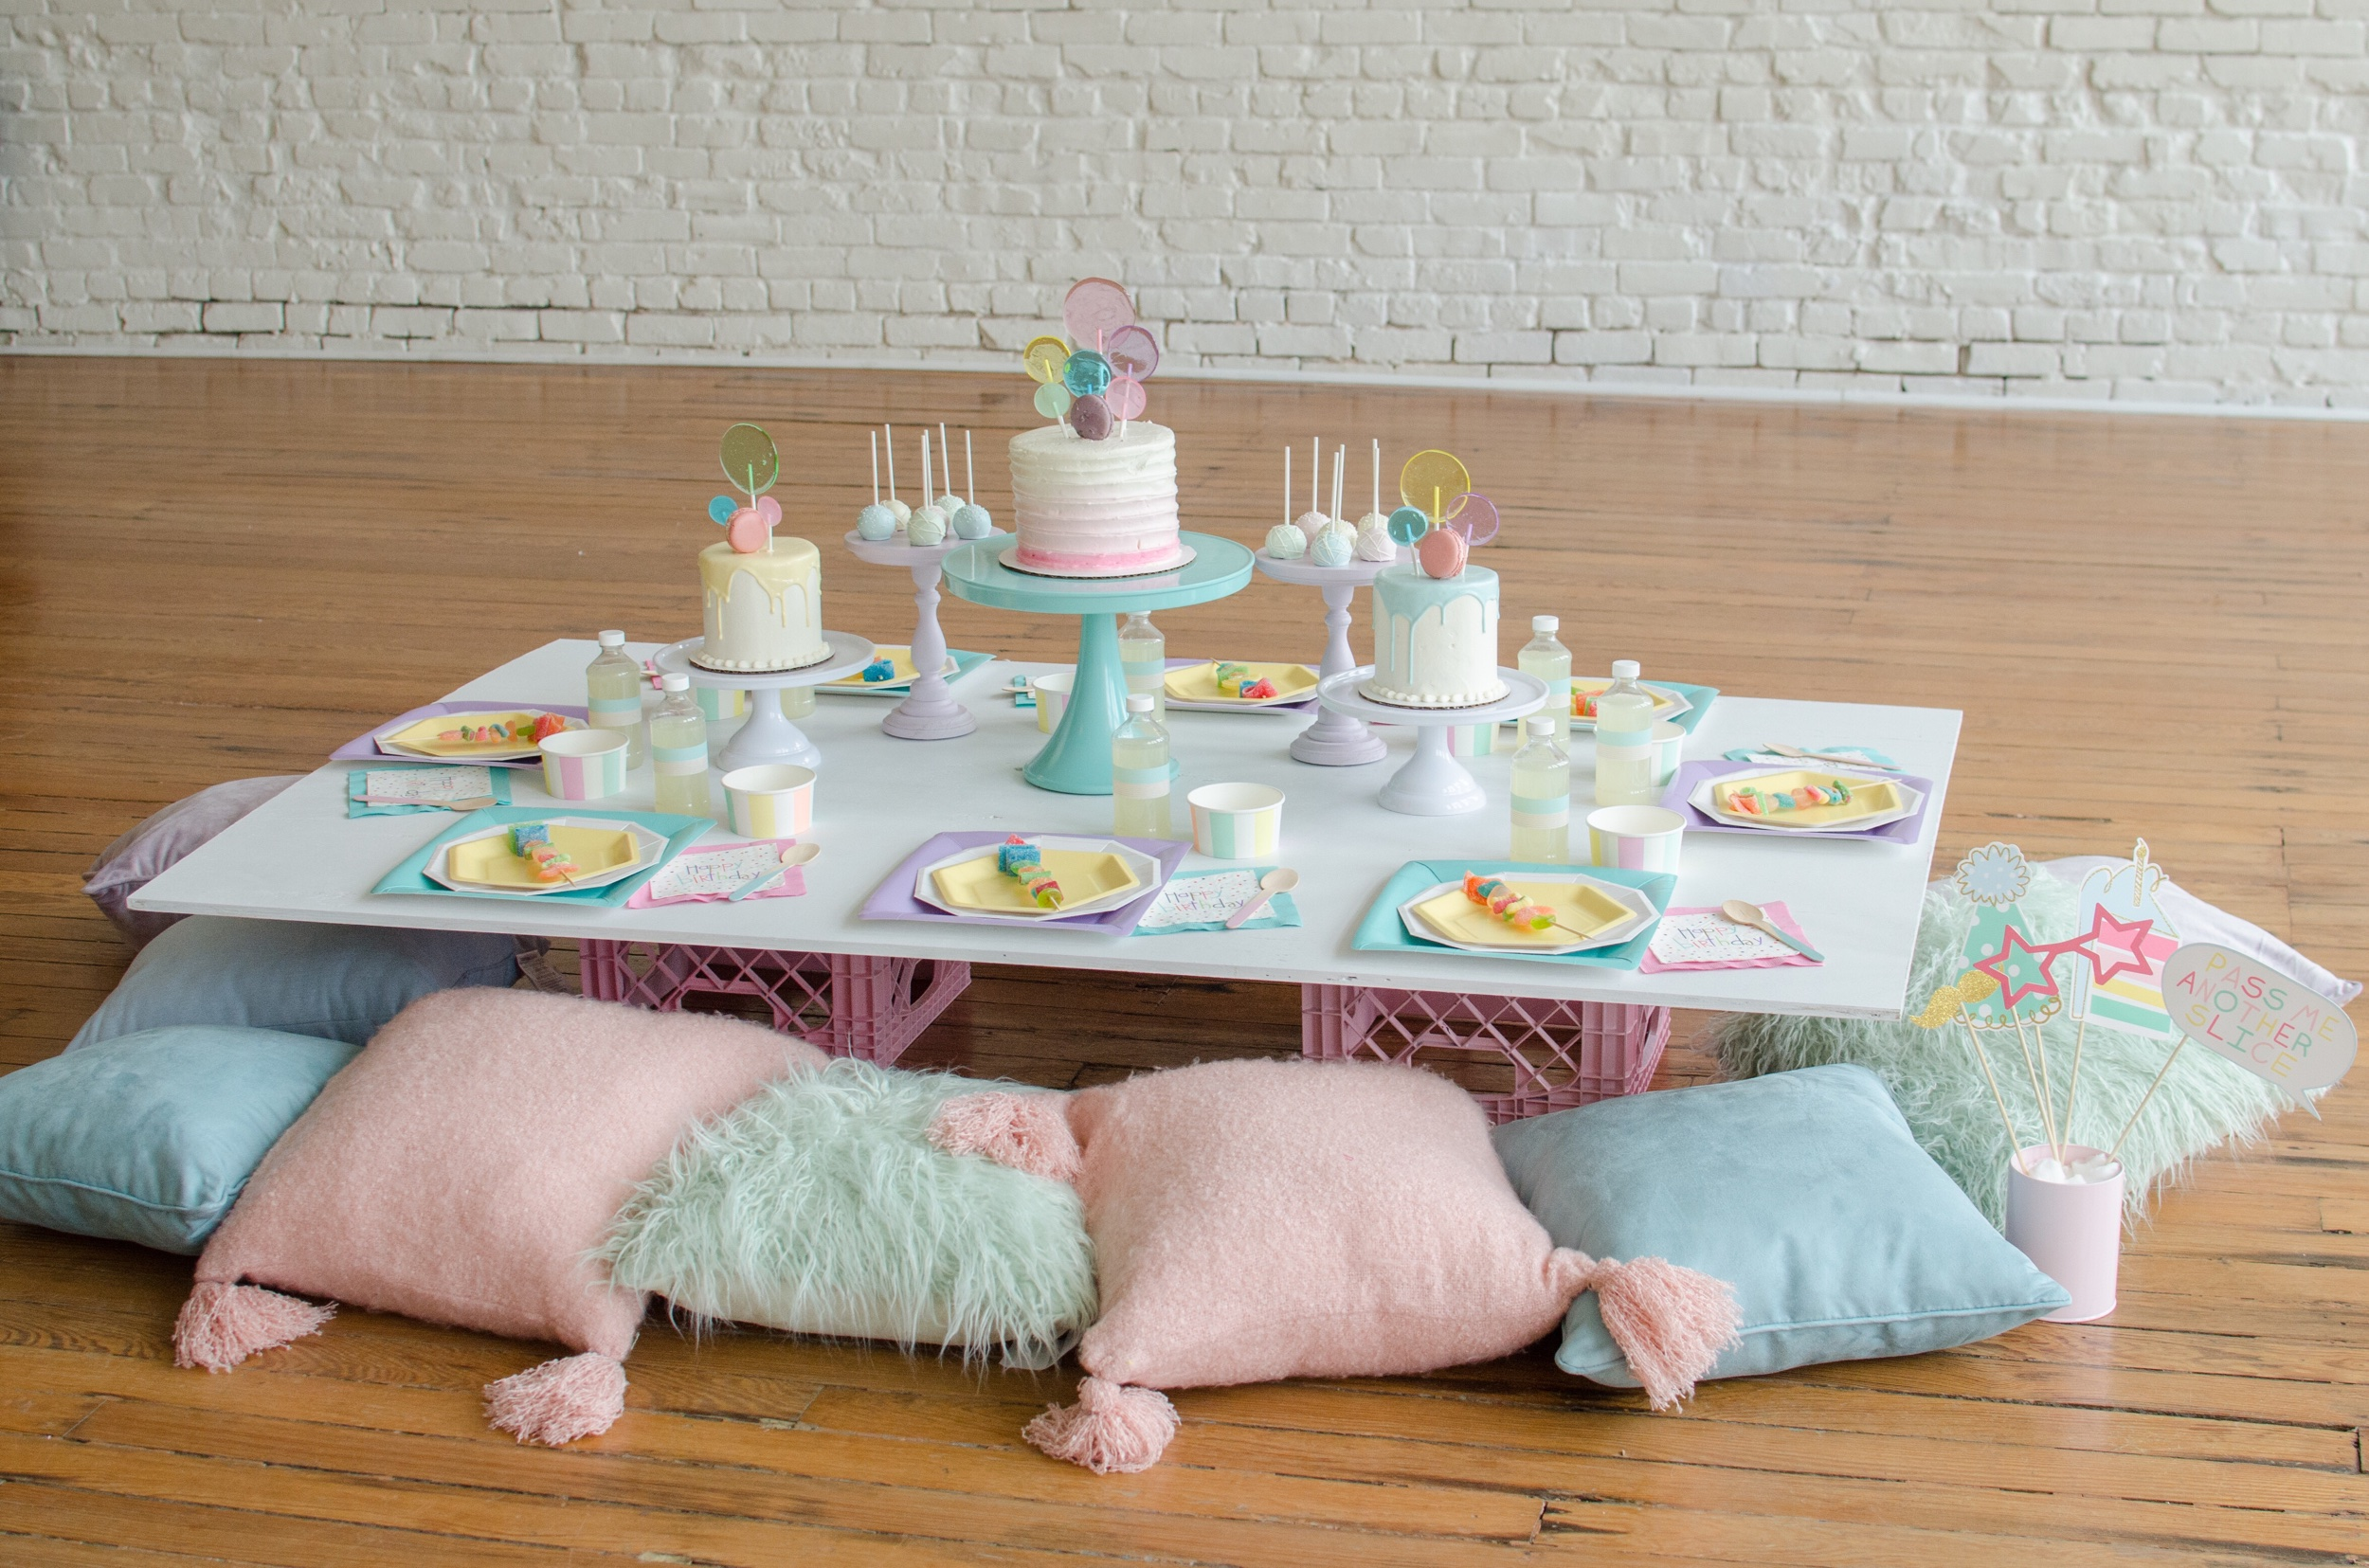 Pastel party color scheme, so cute for little girls!